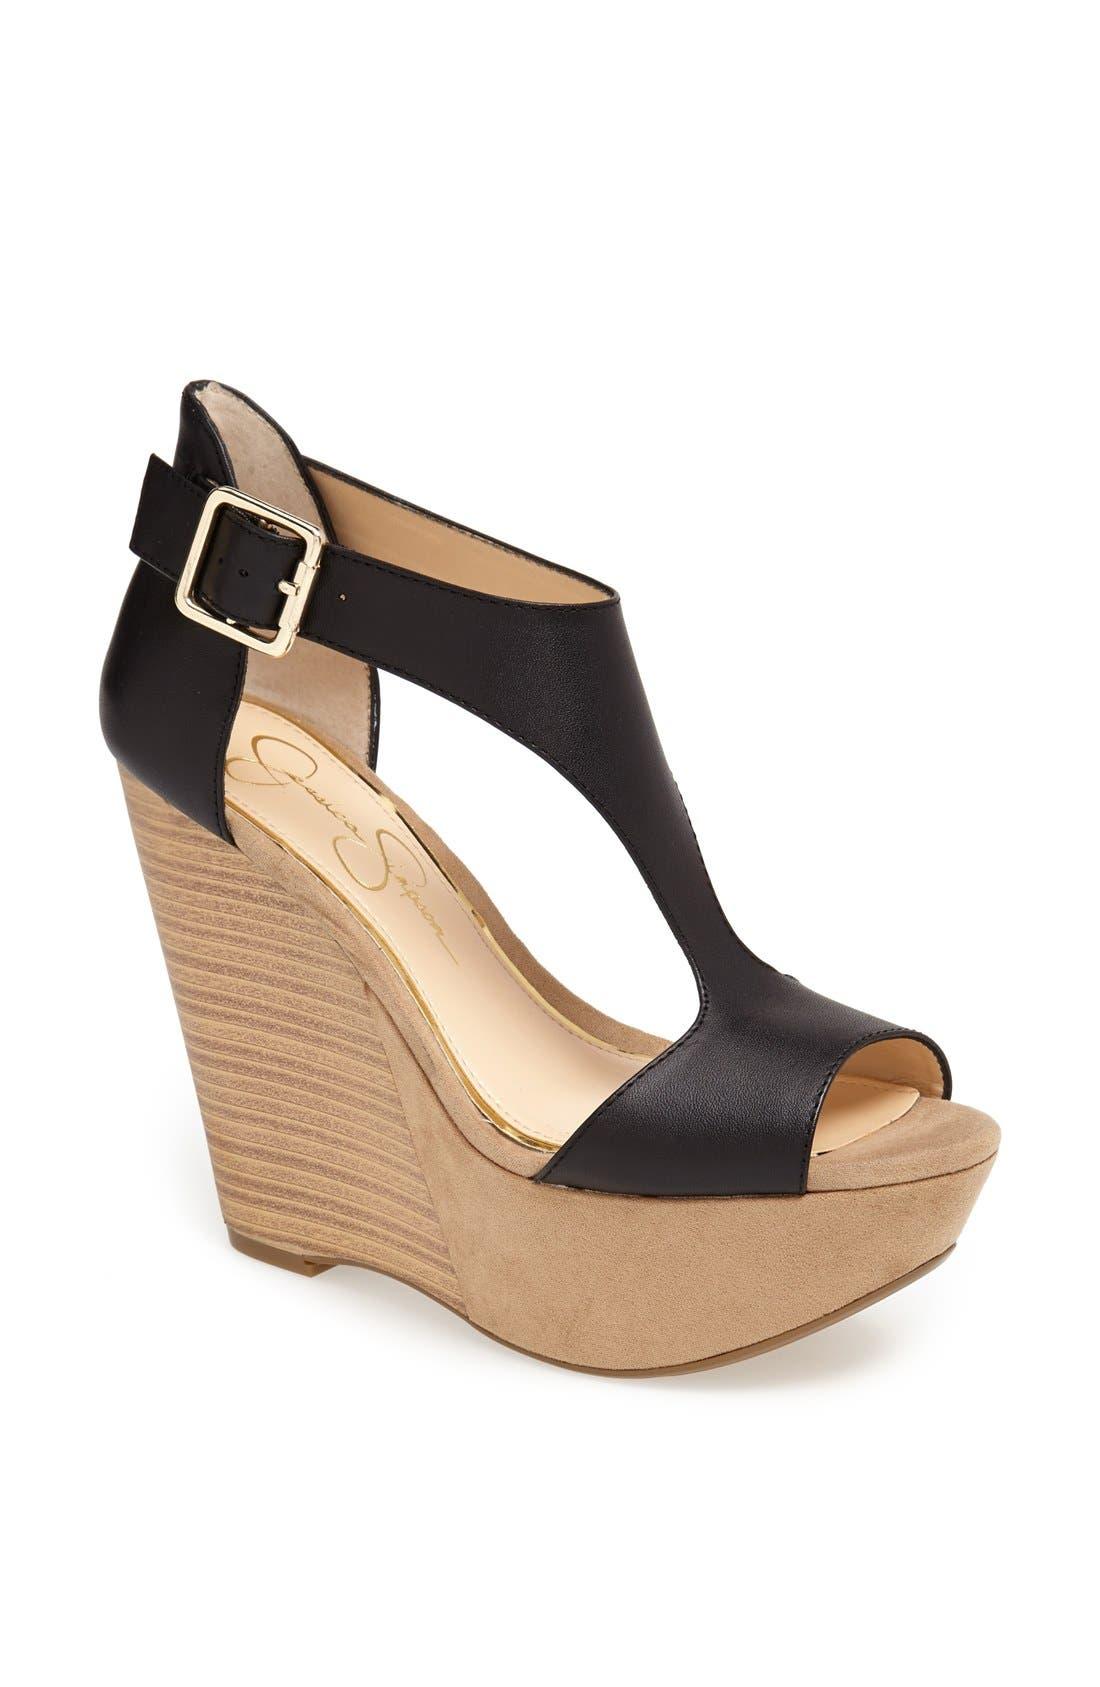 Main Image - Jessica Simpson 'Kalachee' Sandal